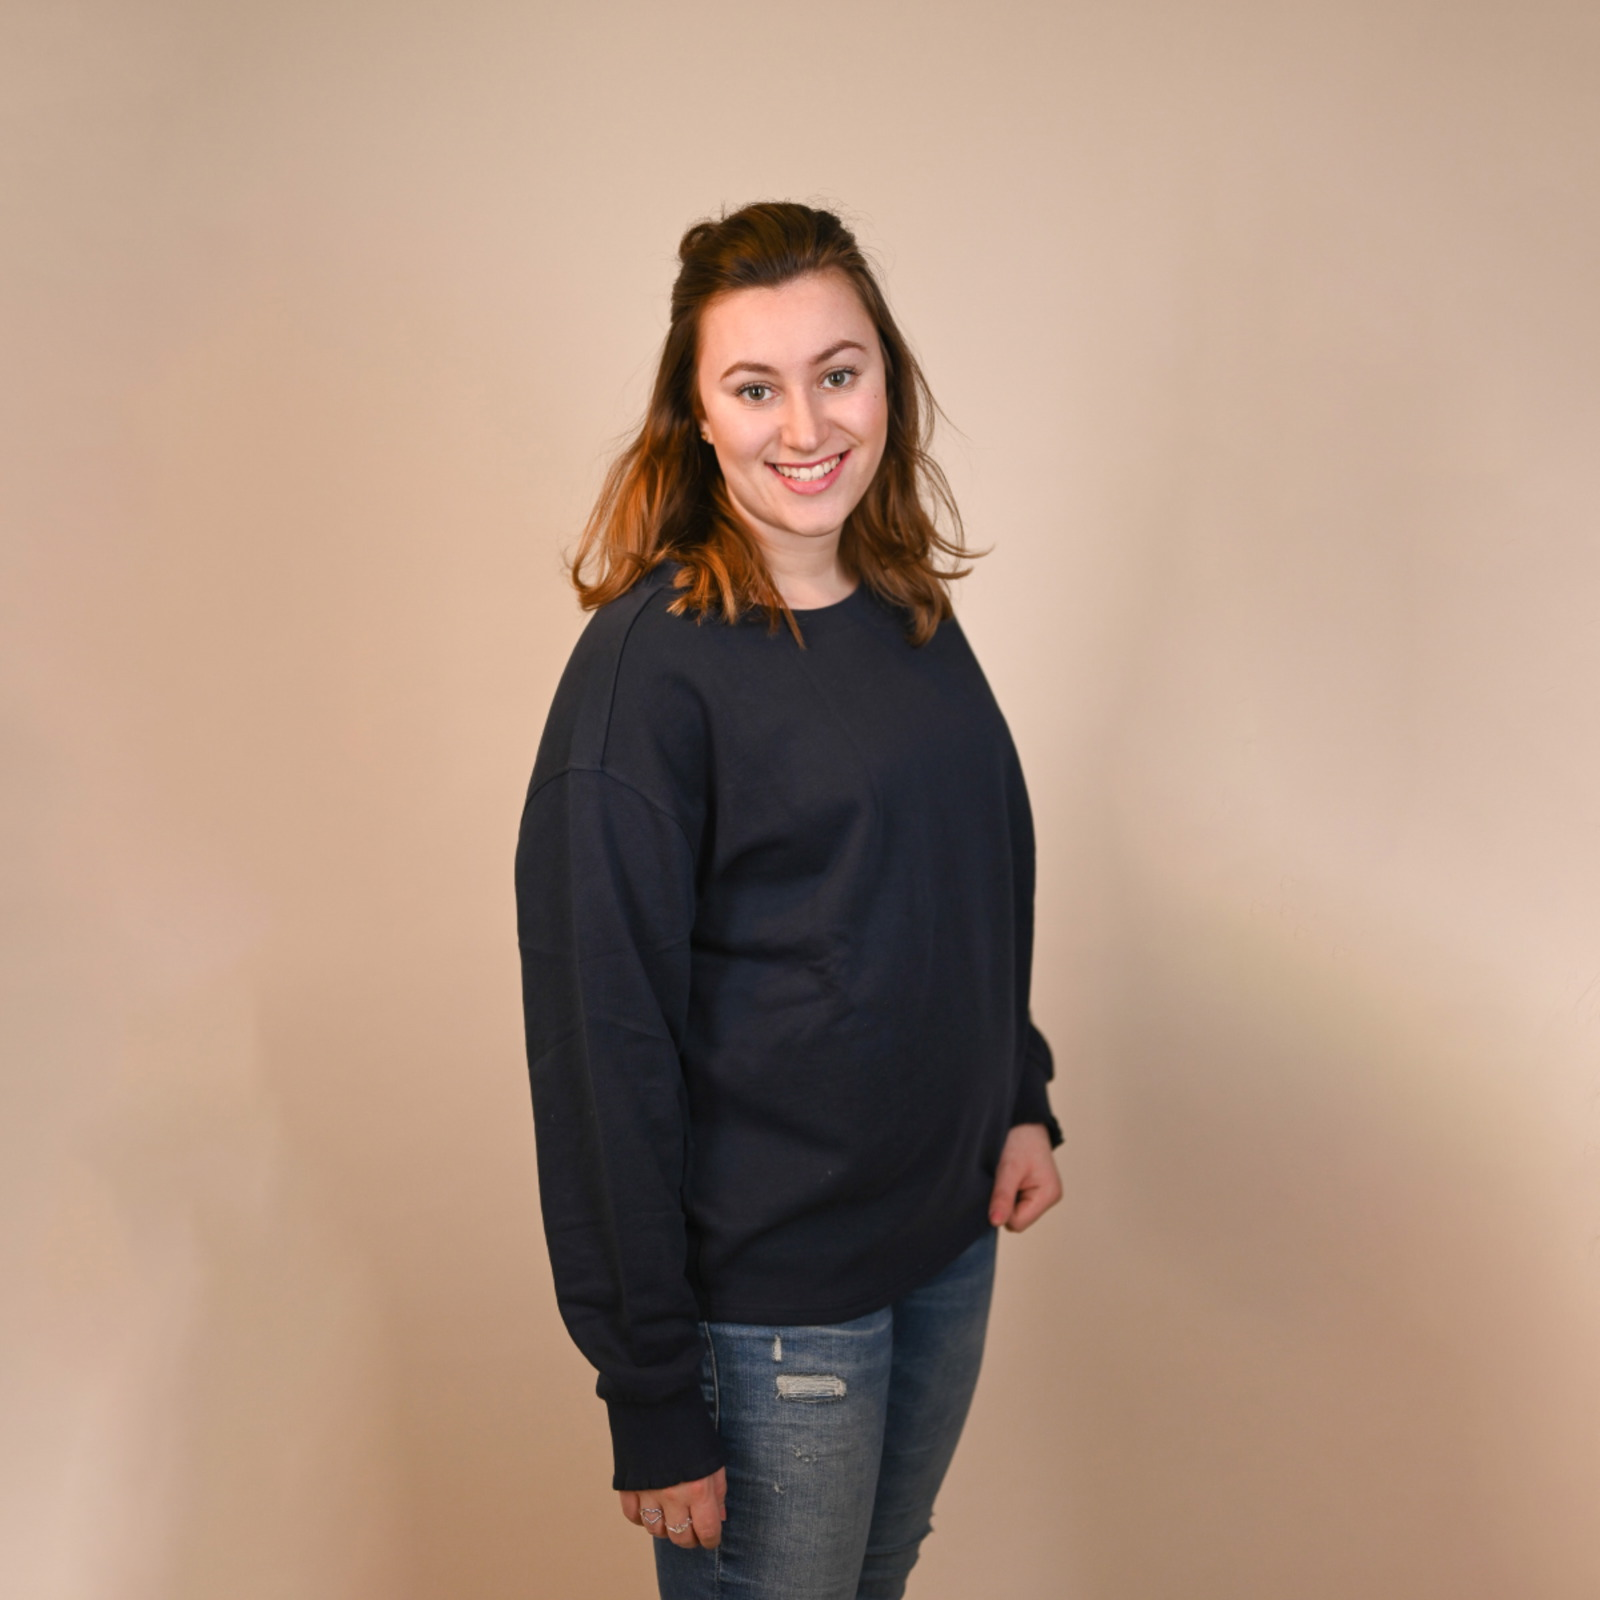 LOVE JOY VICTORY Sweatshirt